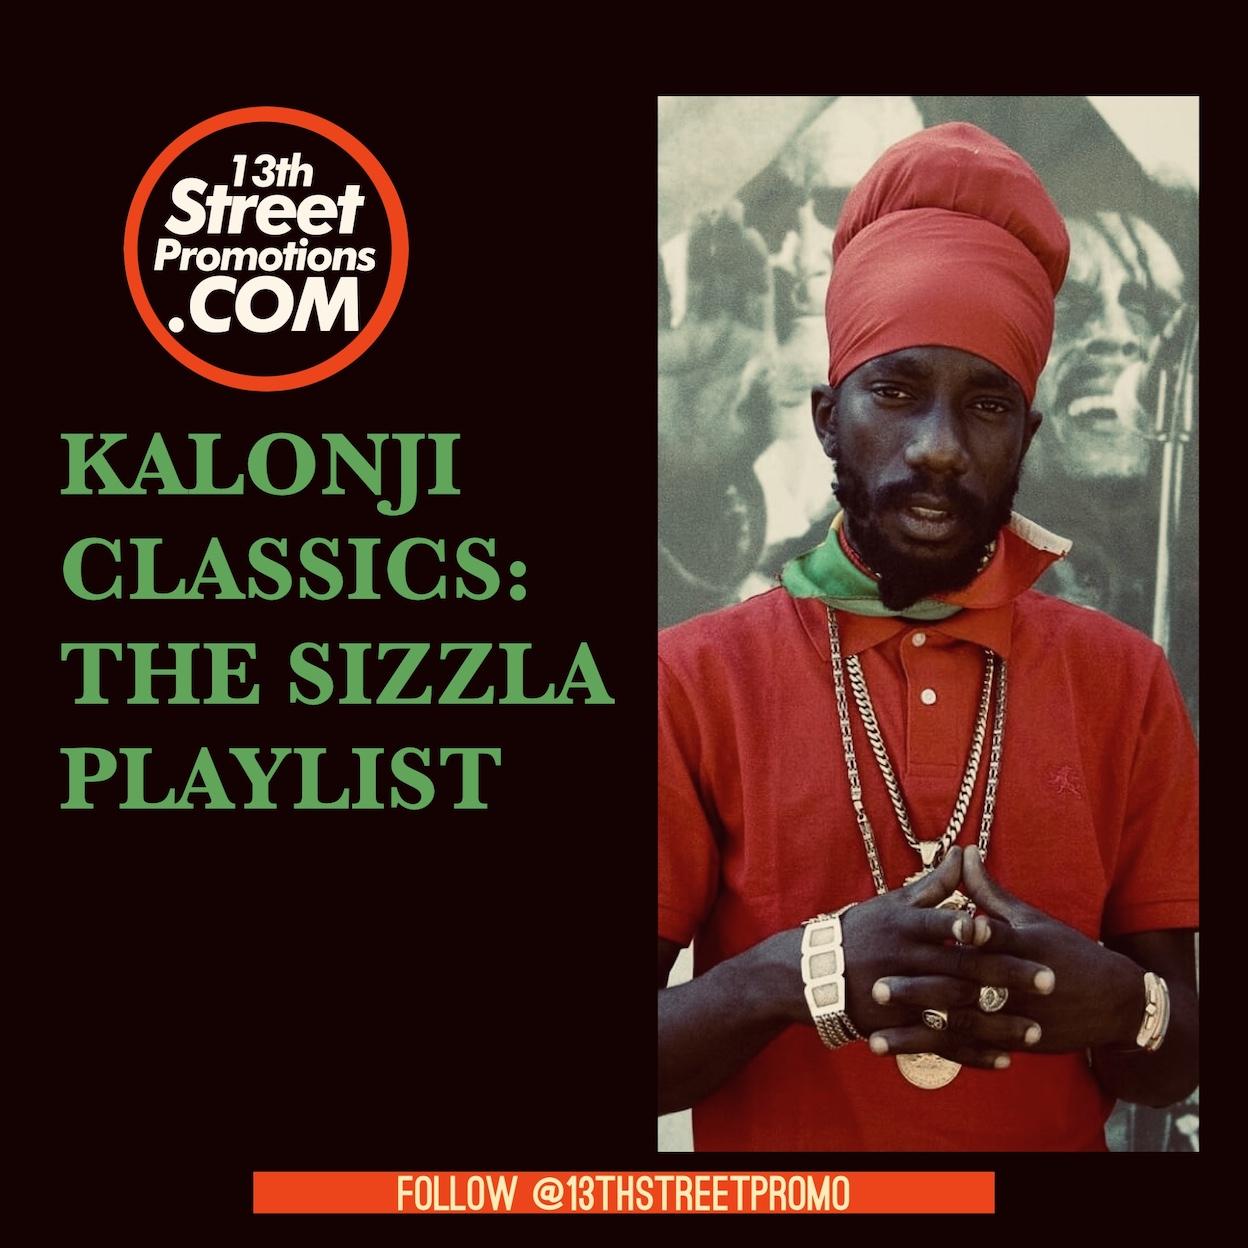 Jamaica Dancehall Music Blog 13thStreetPromo 13thStreetPromotions Sizzla Kalonji Sizzla Playlist Judgement Yard Caribbean Rastafari Rasta Dancehall Reggae Africa